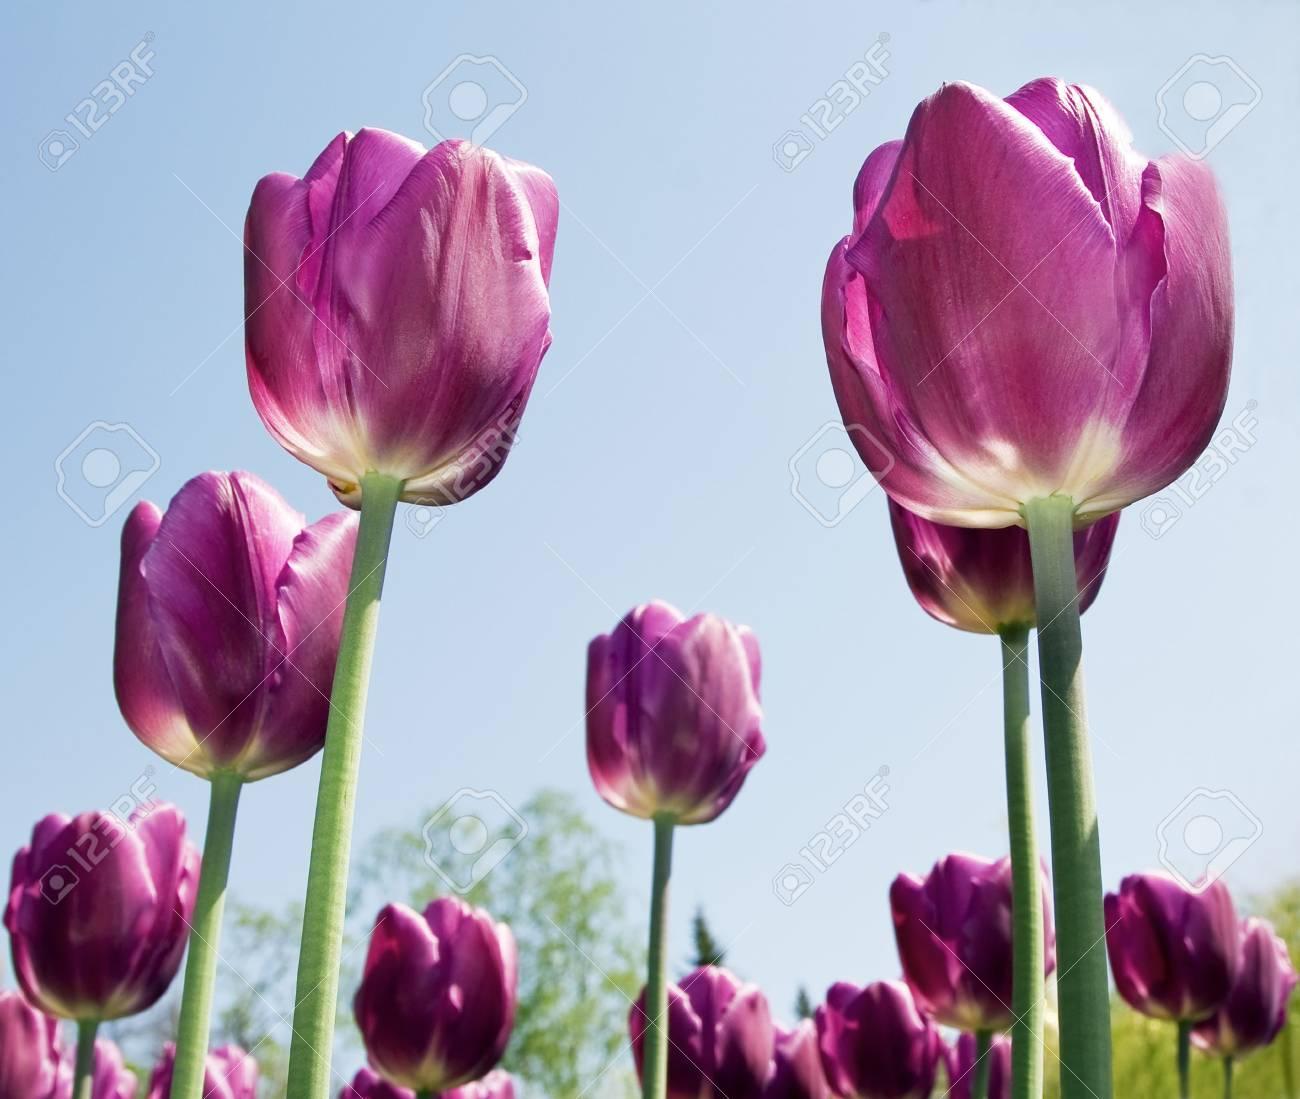 Purple flowers tulips close-up background Stock Photo - 7928514